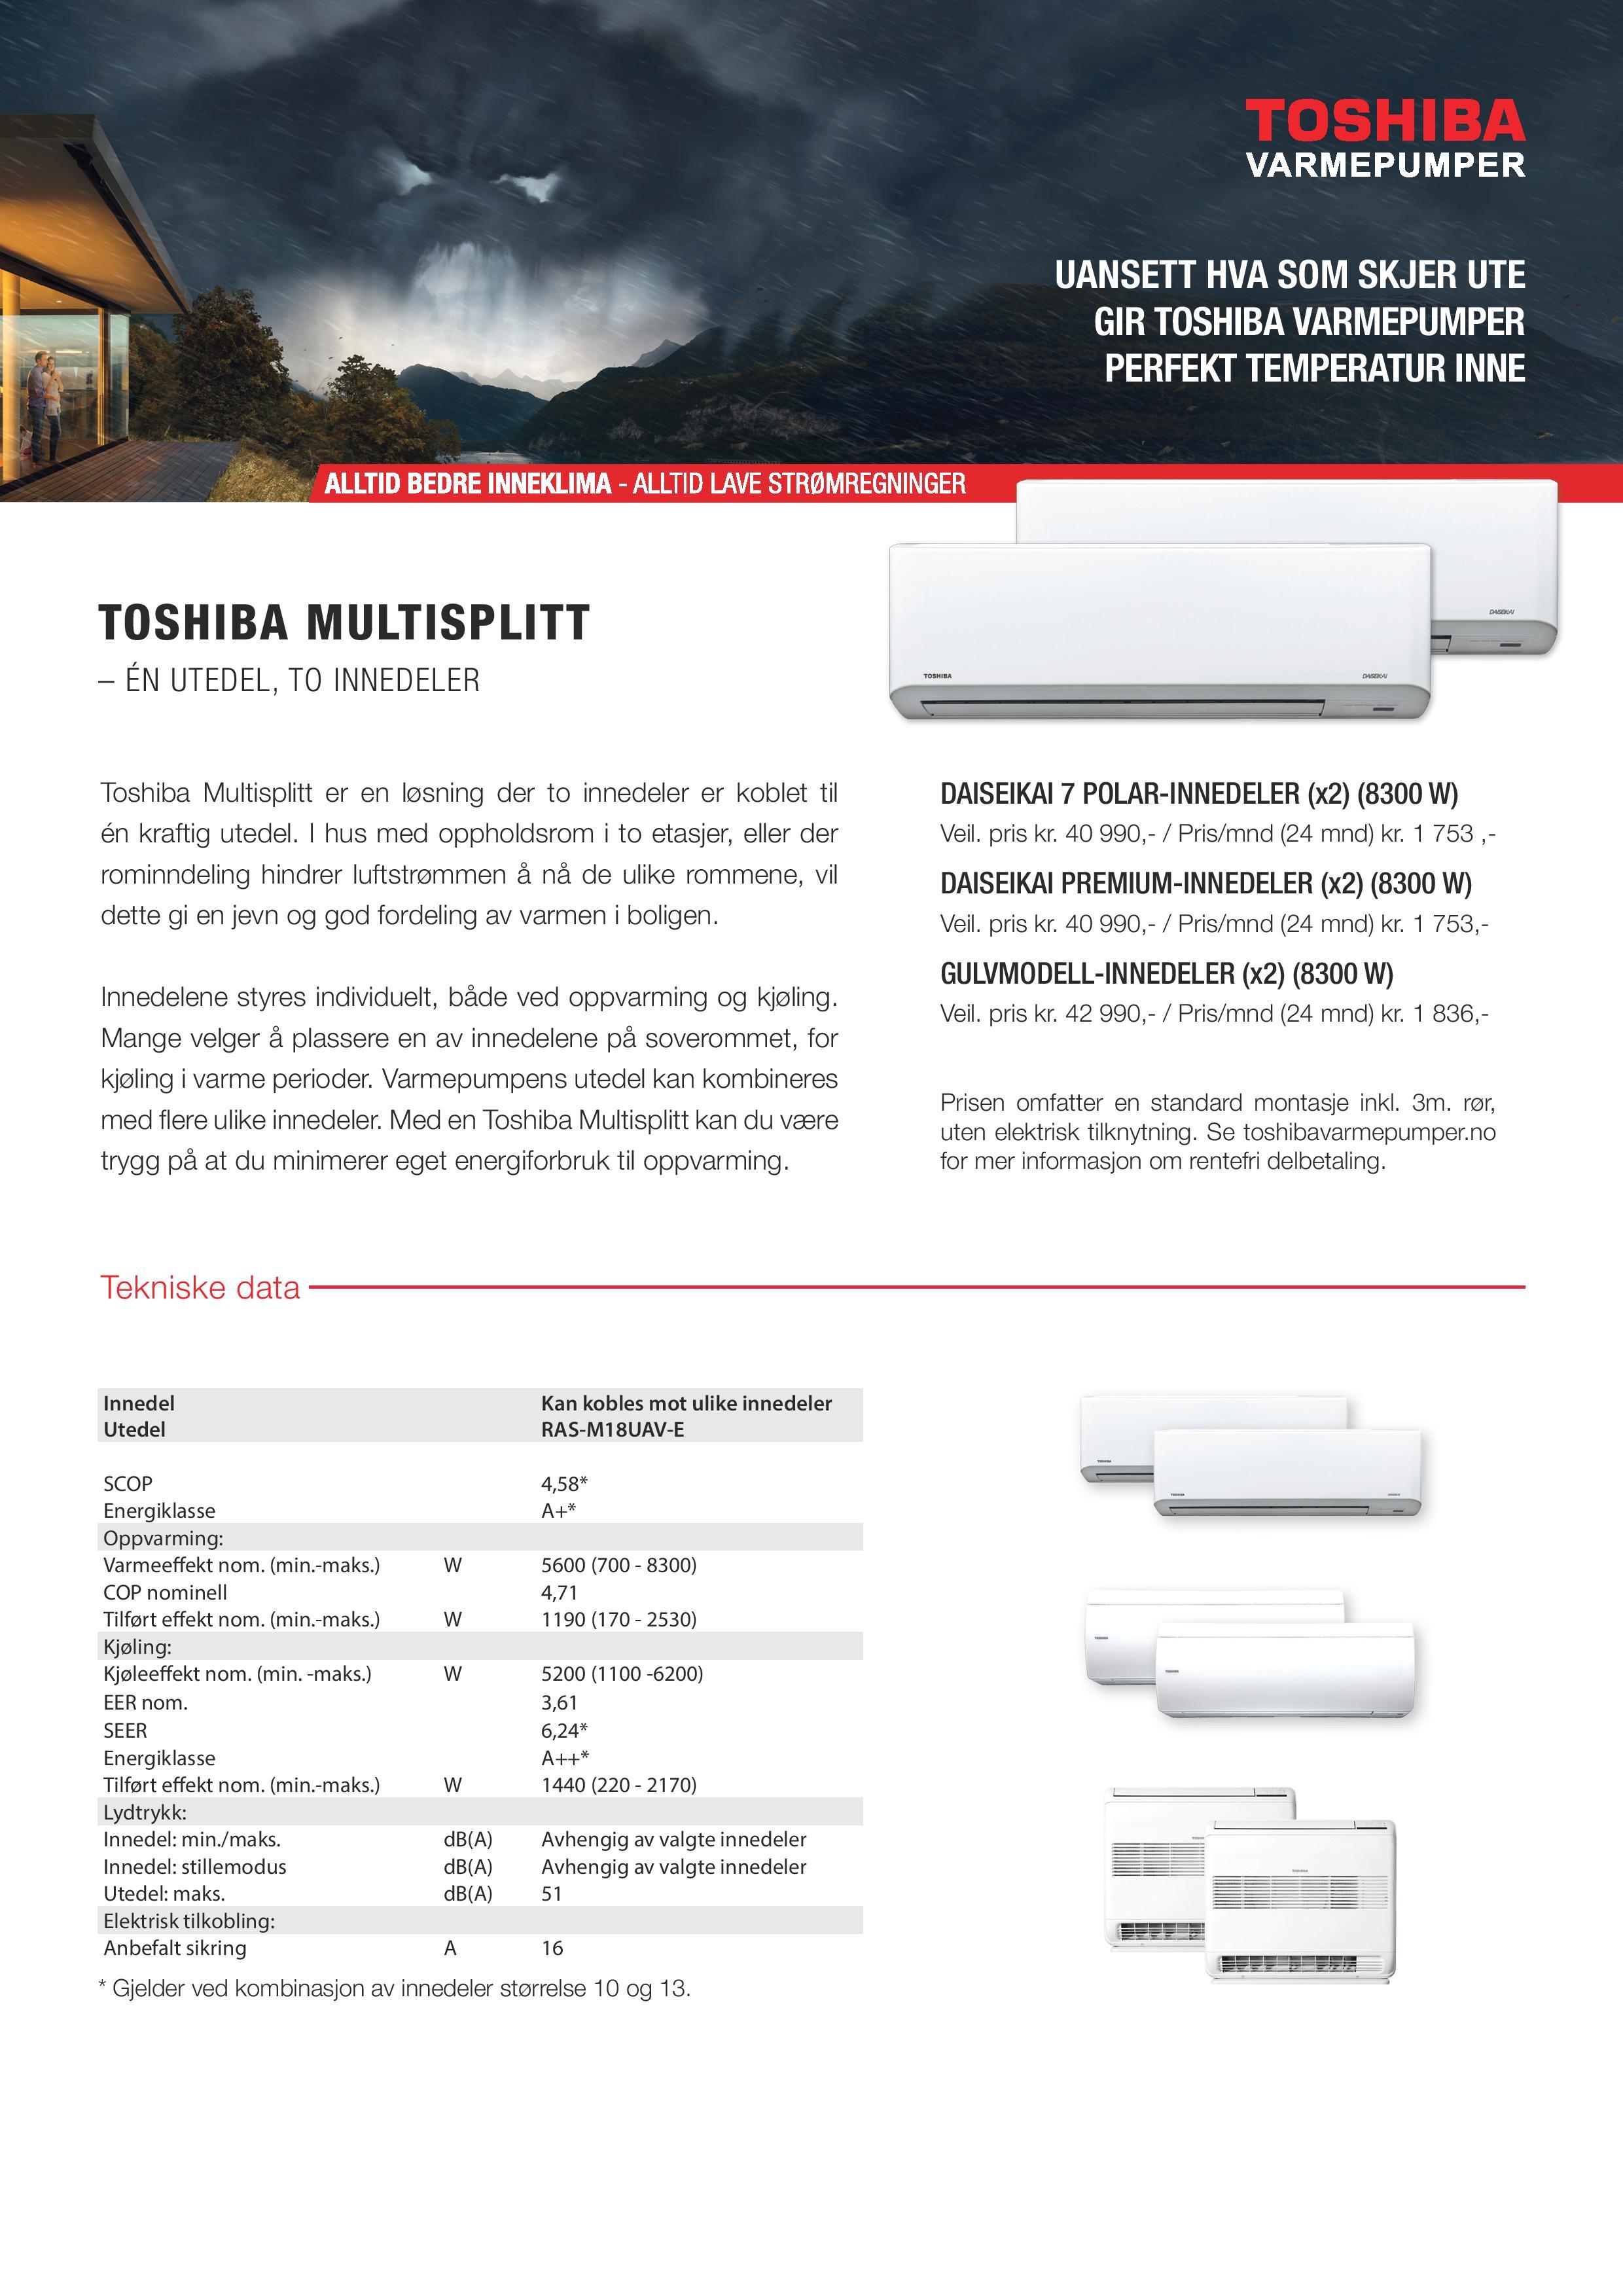 2016-jan-produktark-toshiba-multisplitt-page-001